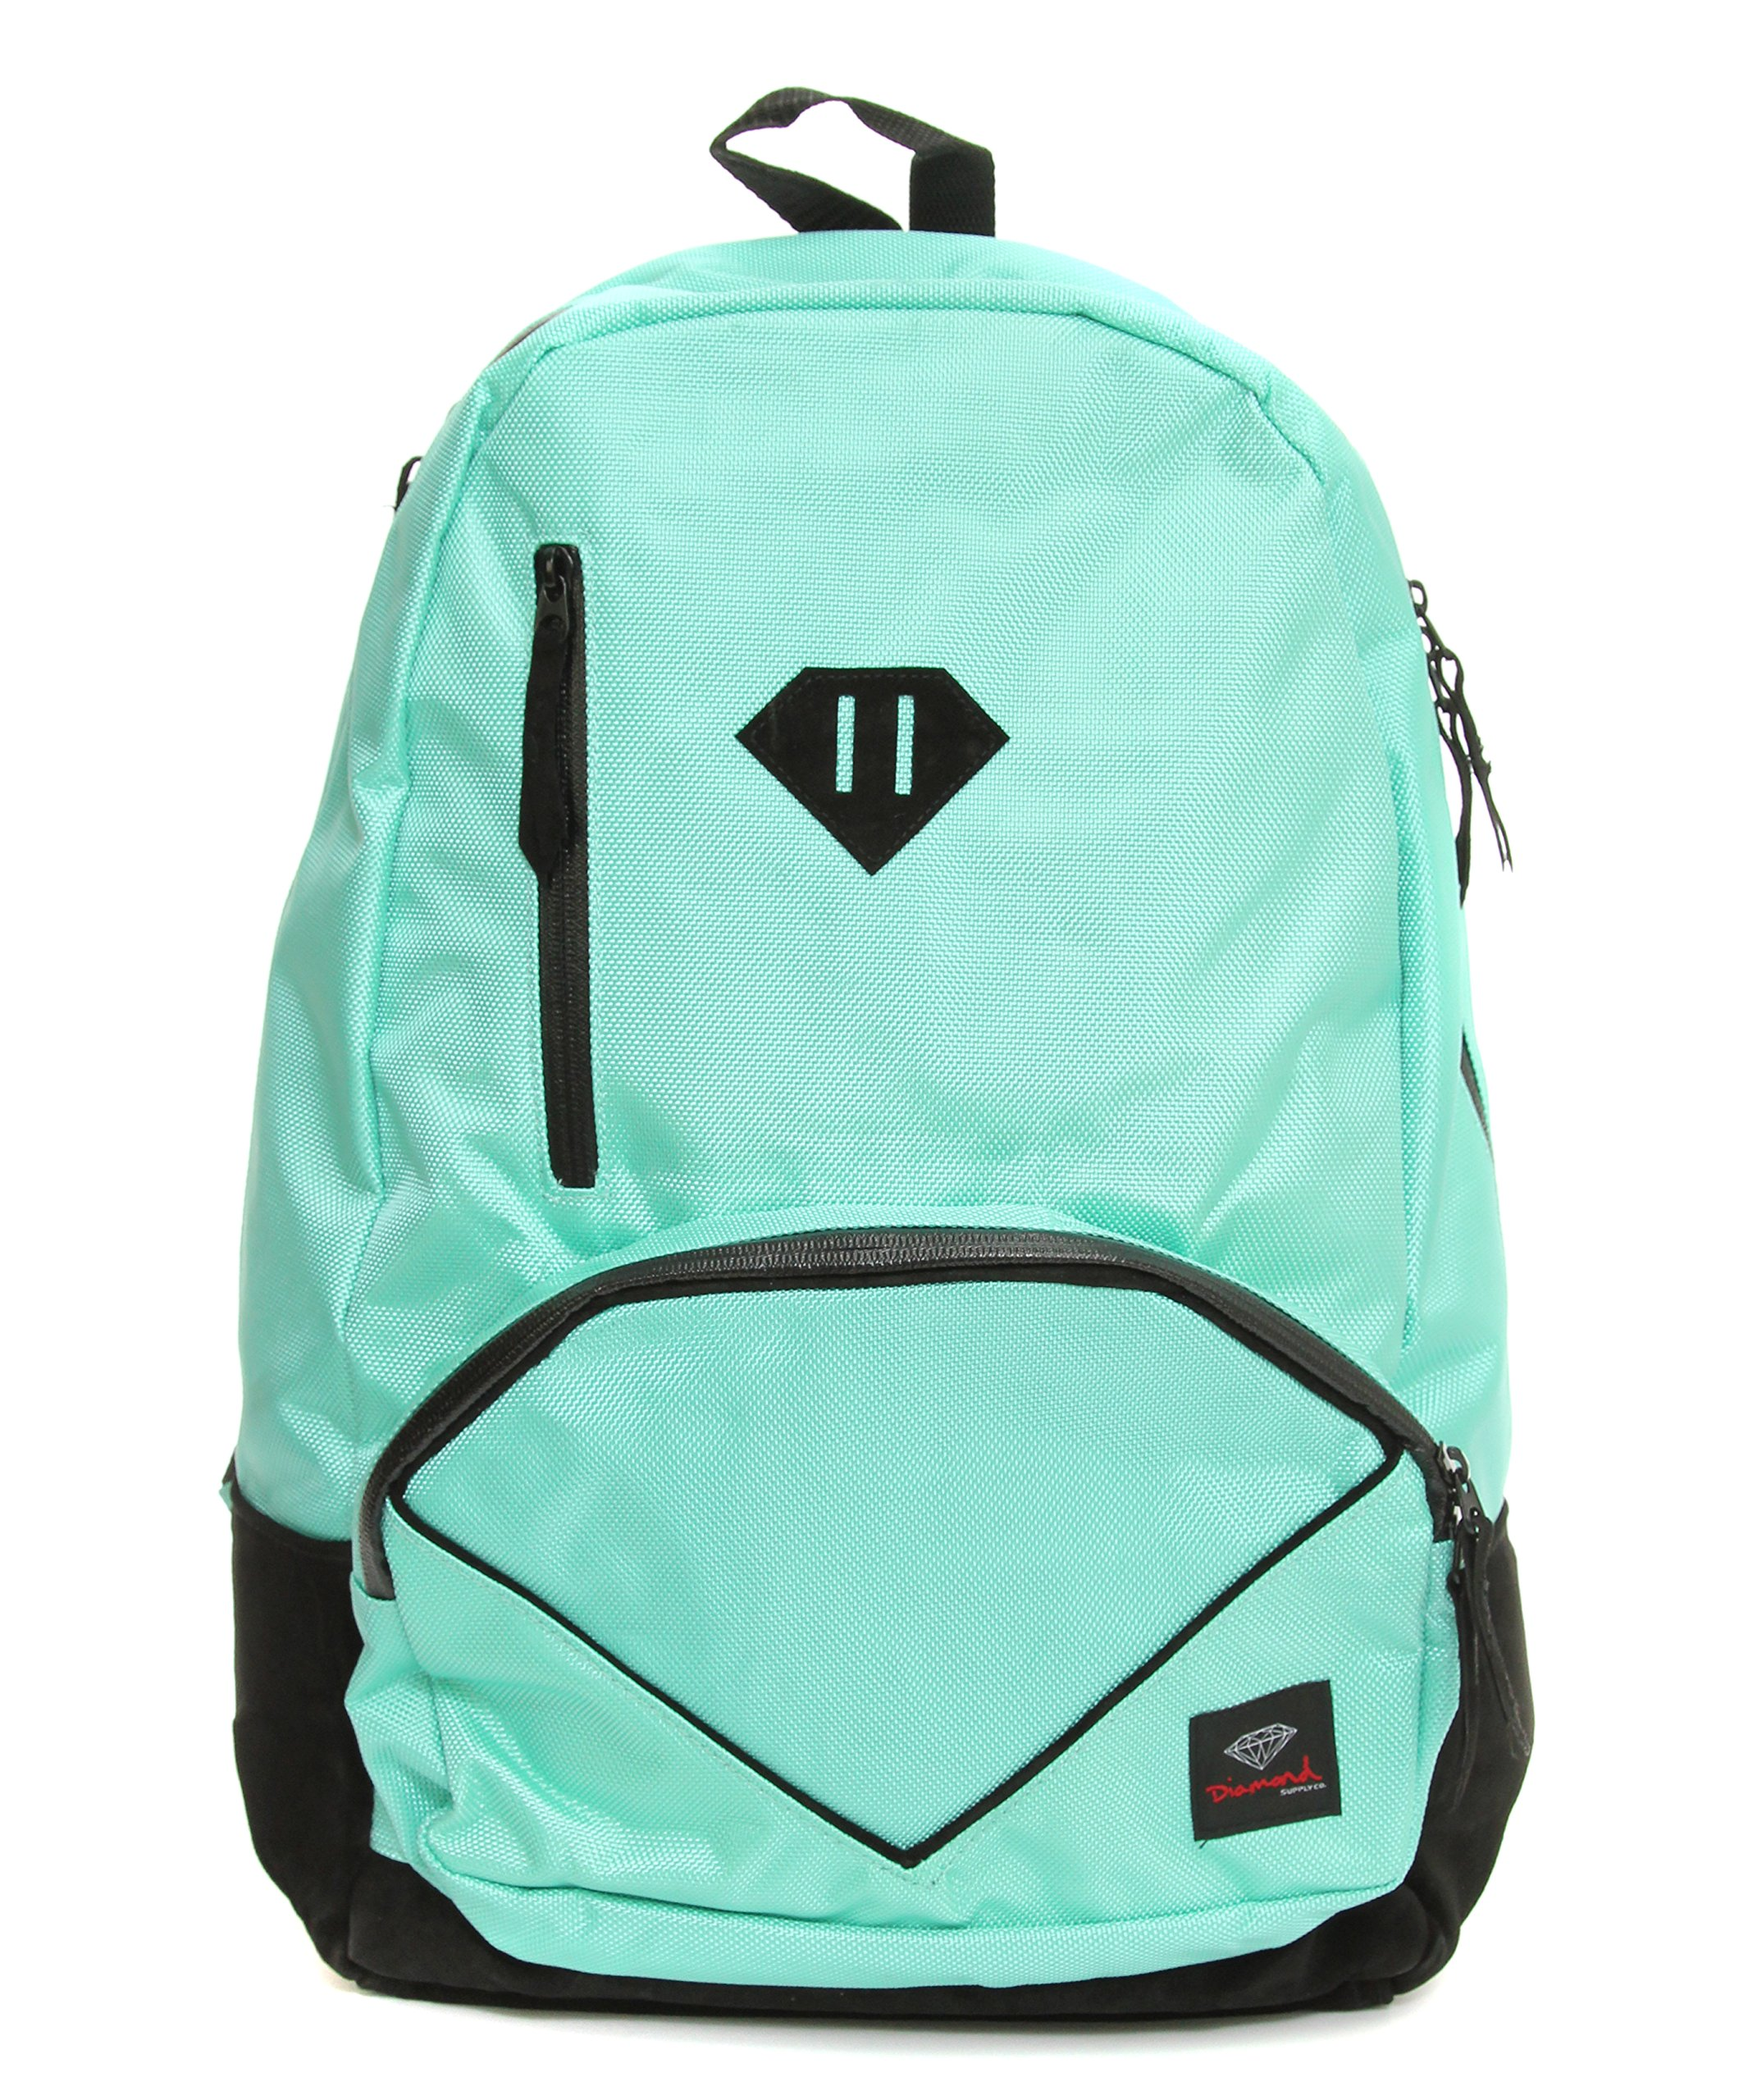 Diamond Supply Co. Life Backpack-Blue/Black